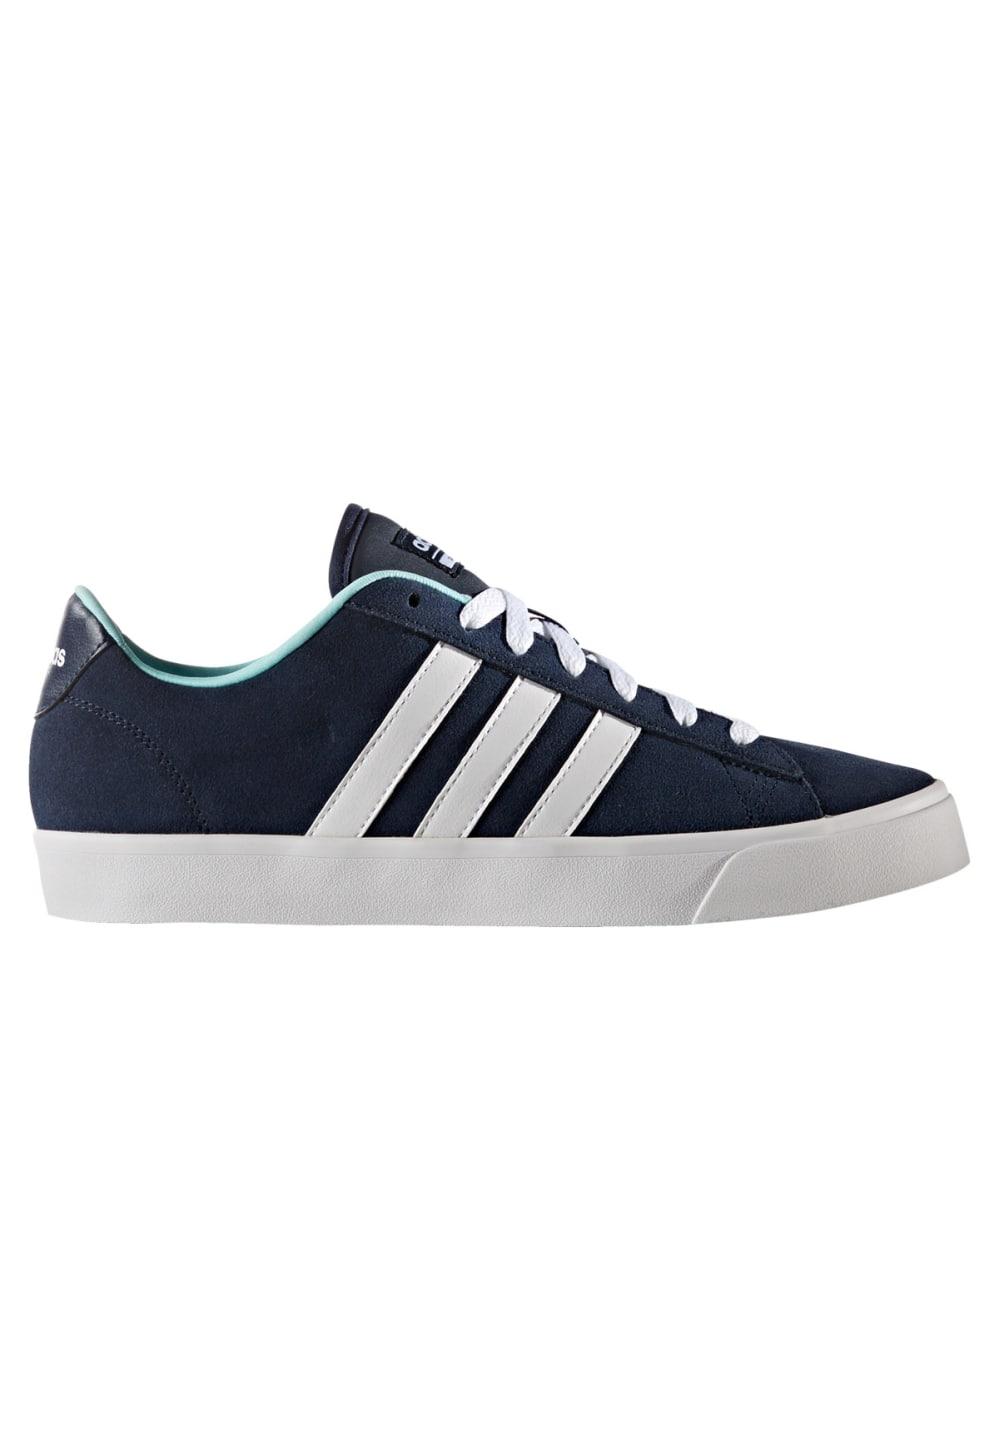 Sneakers für Frauen - adidas neo Cloudfoam Daily QT Sneaker für Damen Blau  - Onlineshop 21Run